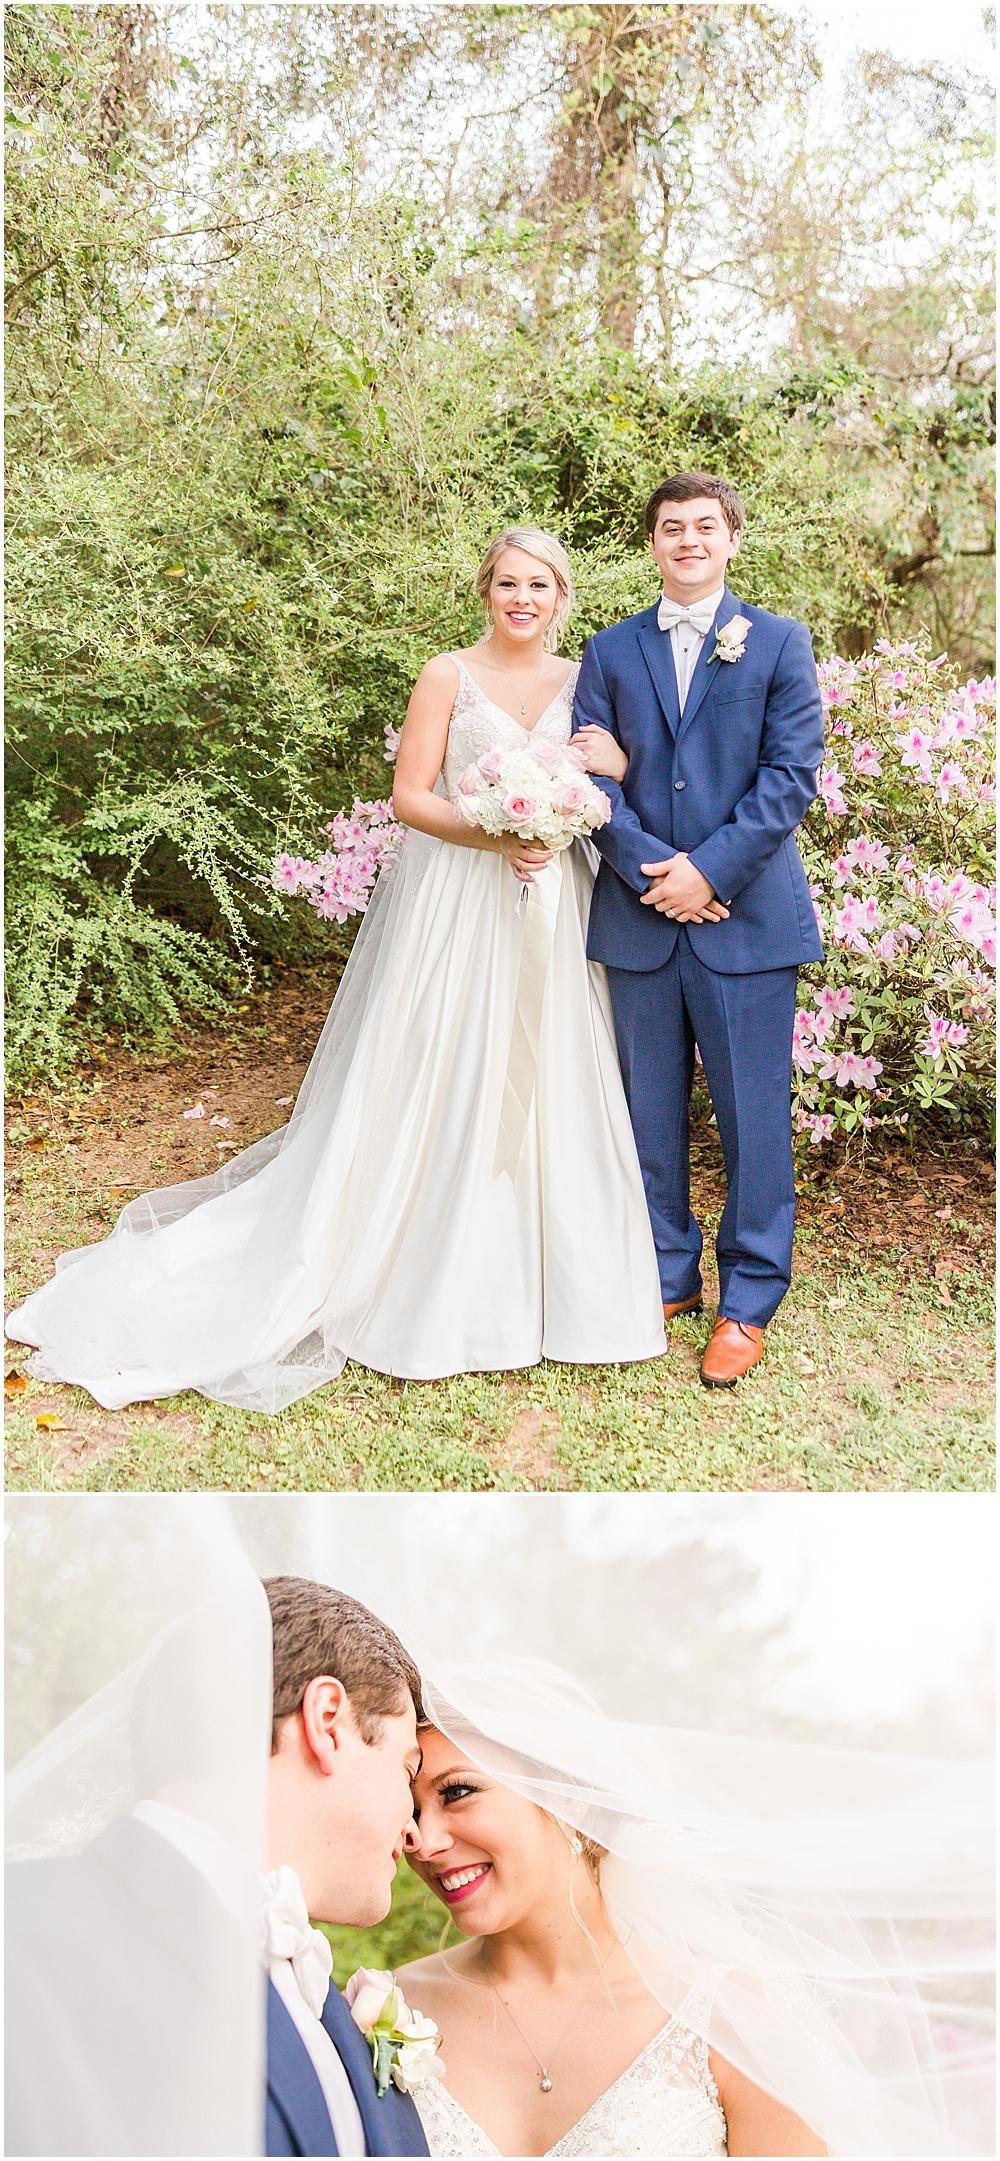 Ashton-Clark-Photography-Wedding-Portrait-Family-Photographer-Mobile-Alabama_0345.jpg